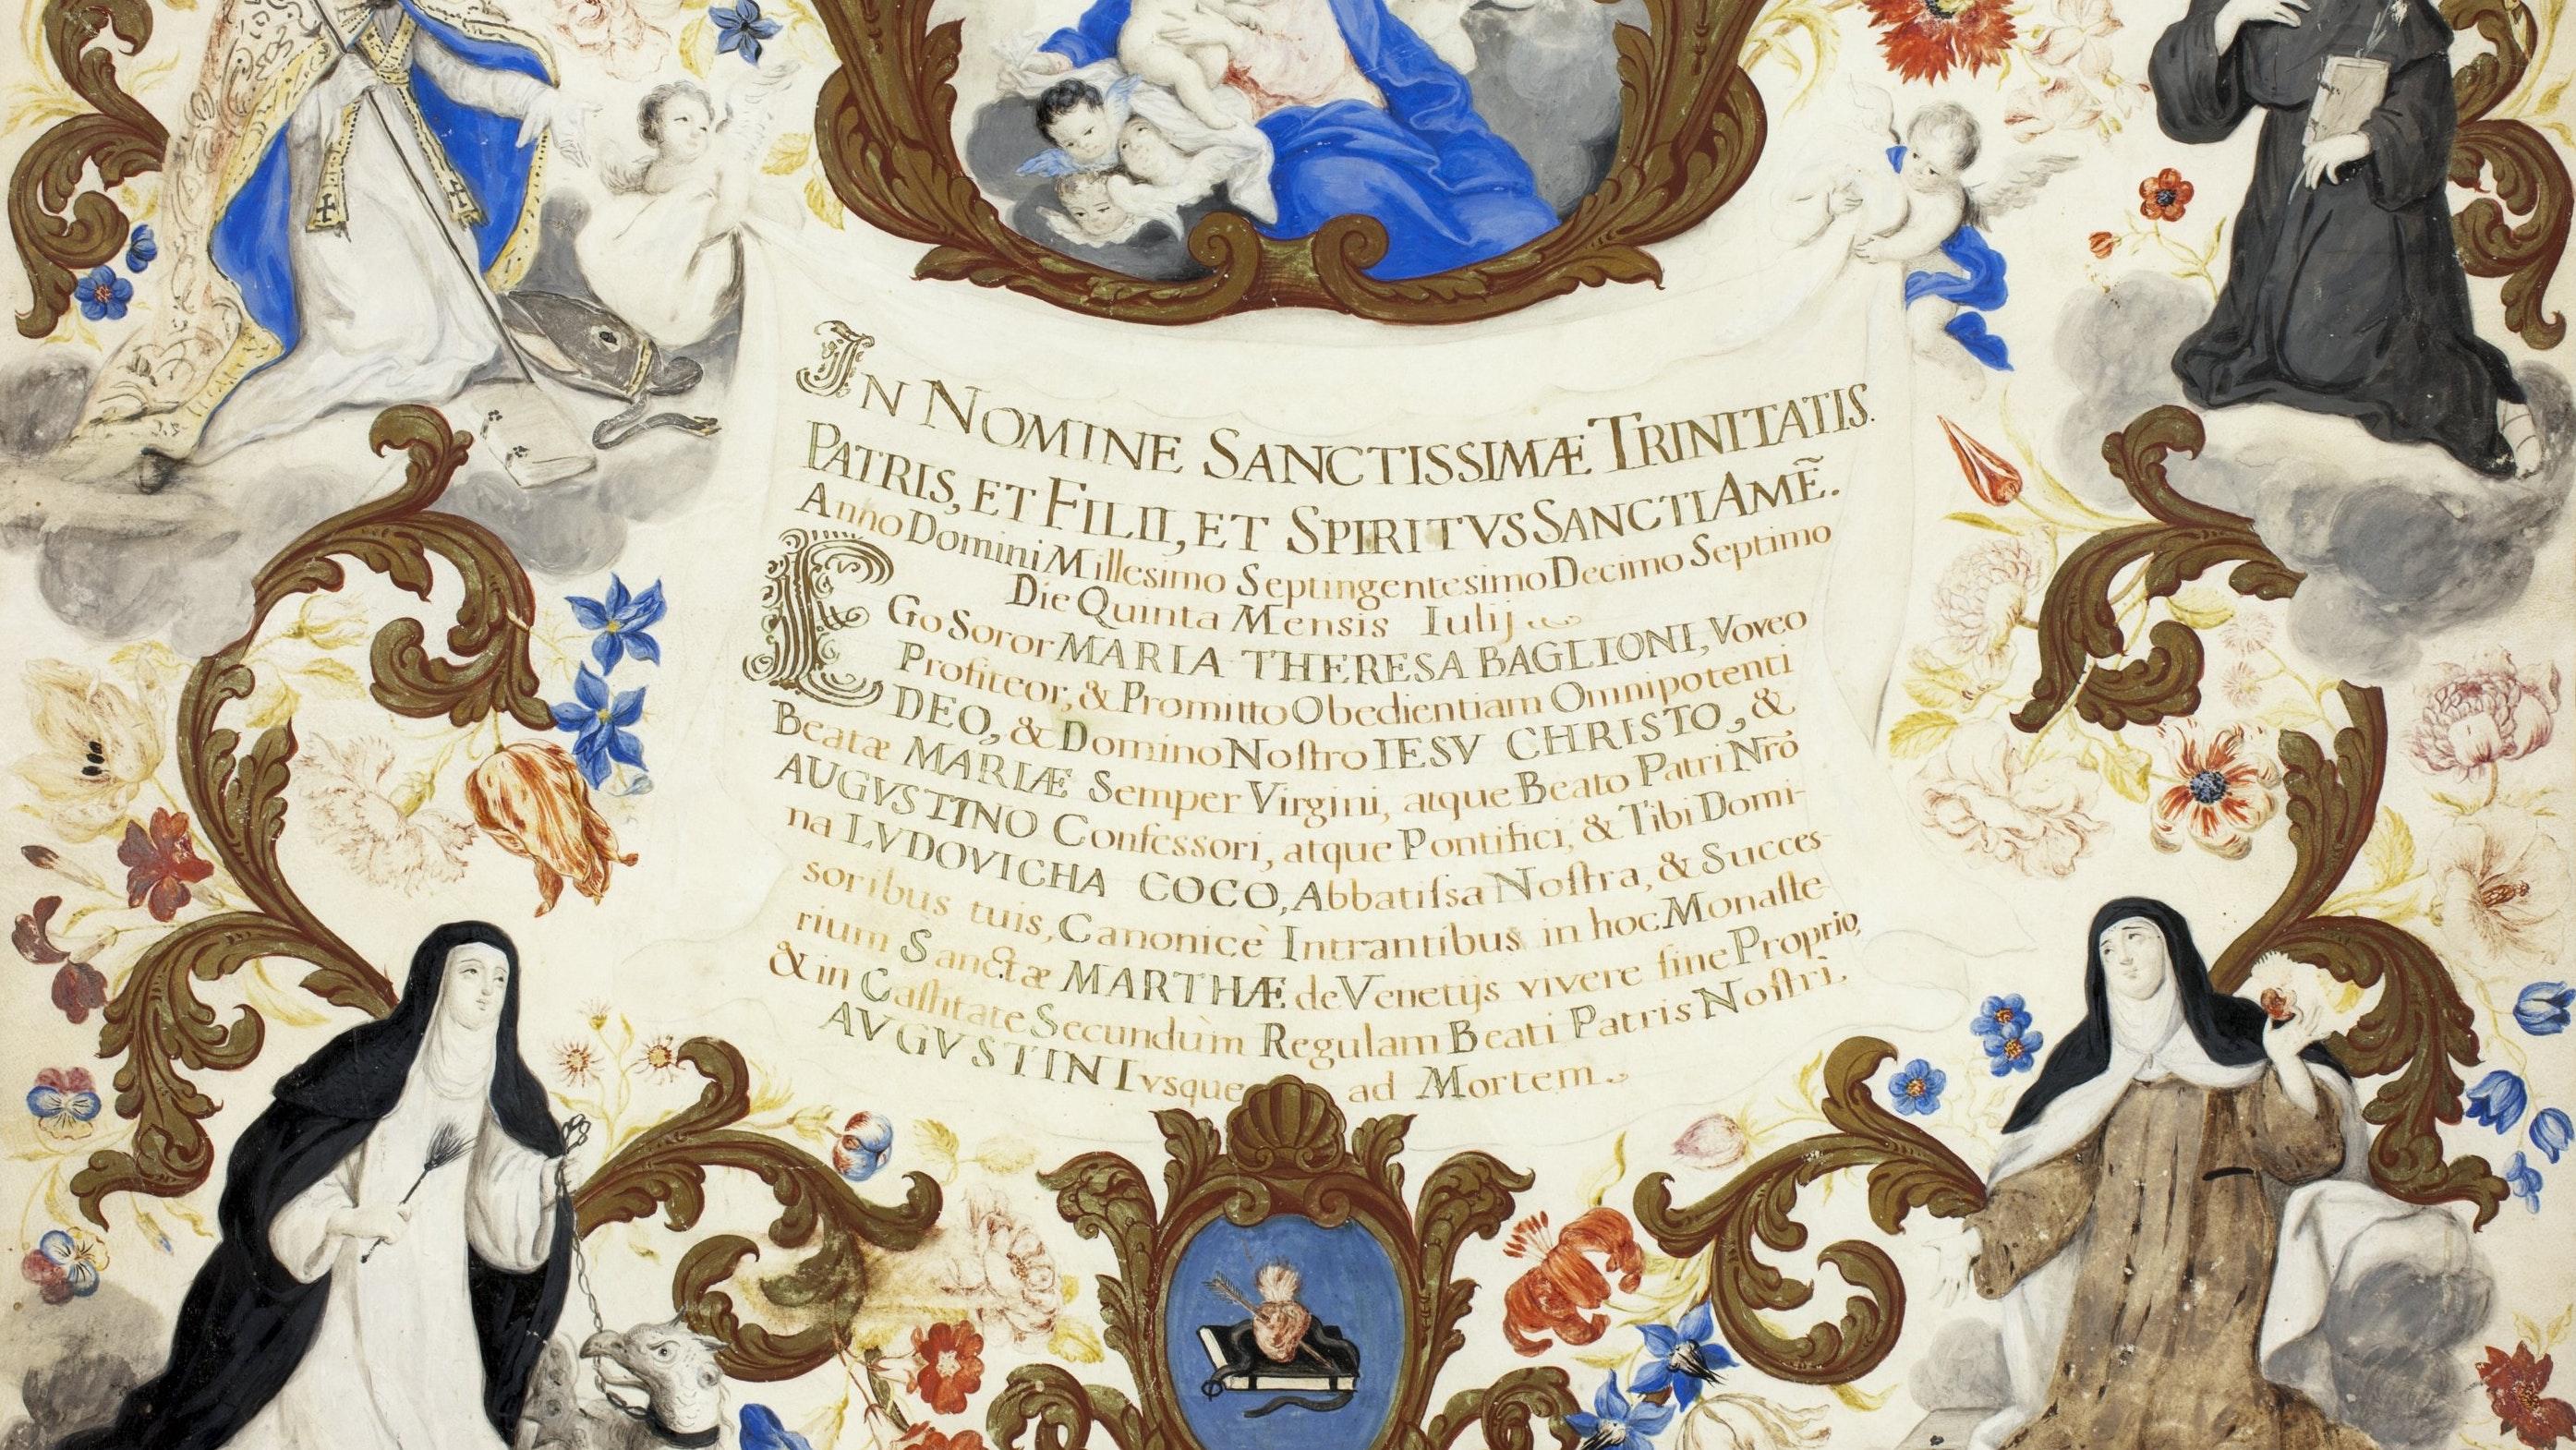 1927.7712 Investiture Certificate Of Sister Maria Theresa Baglioni